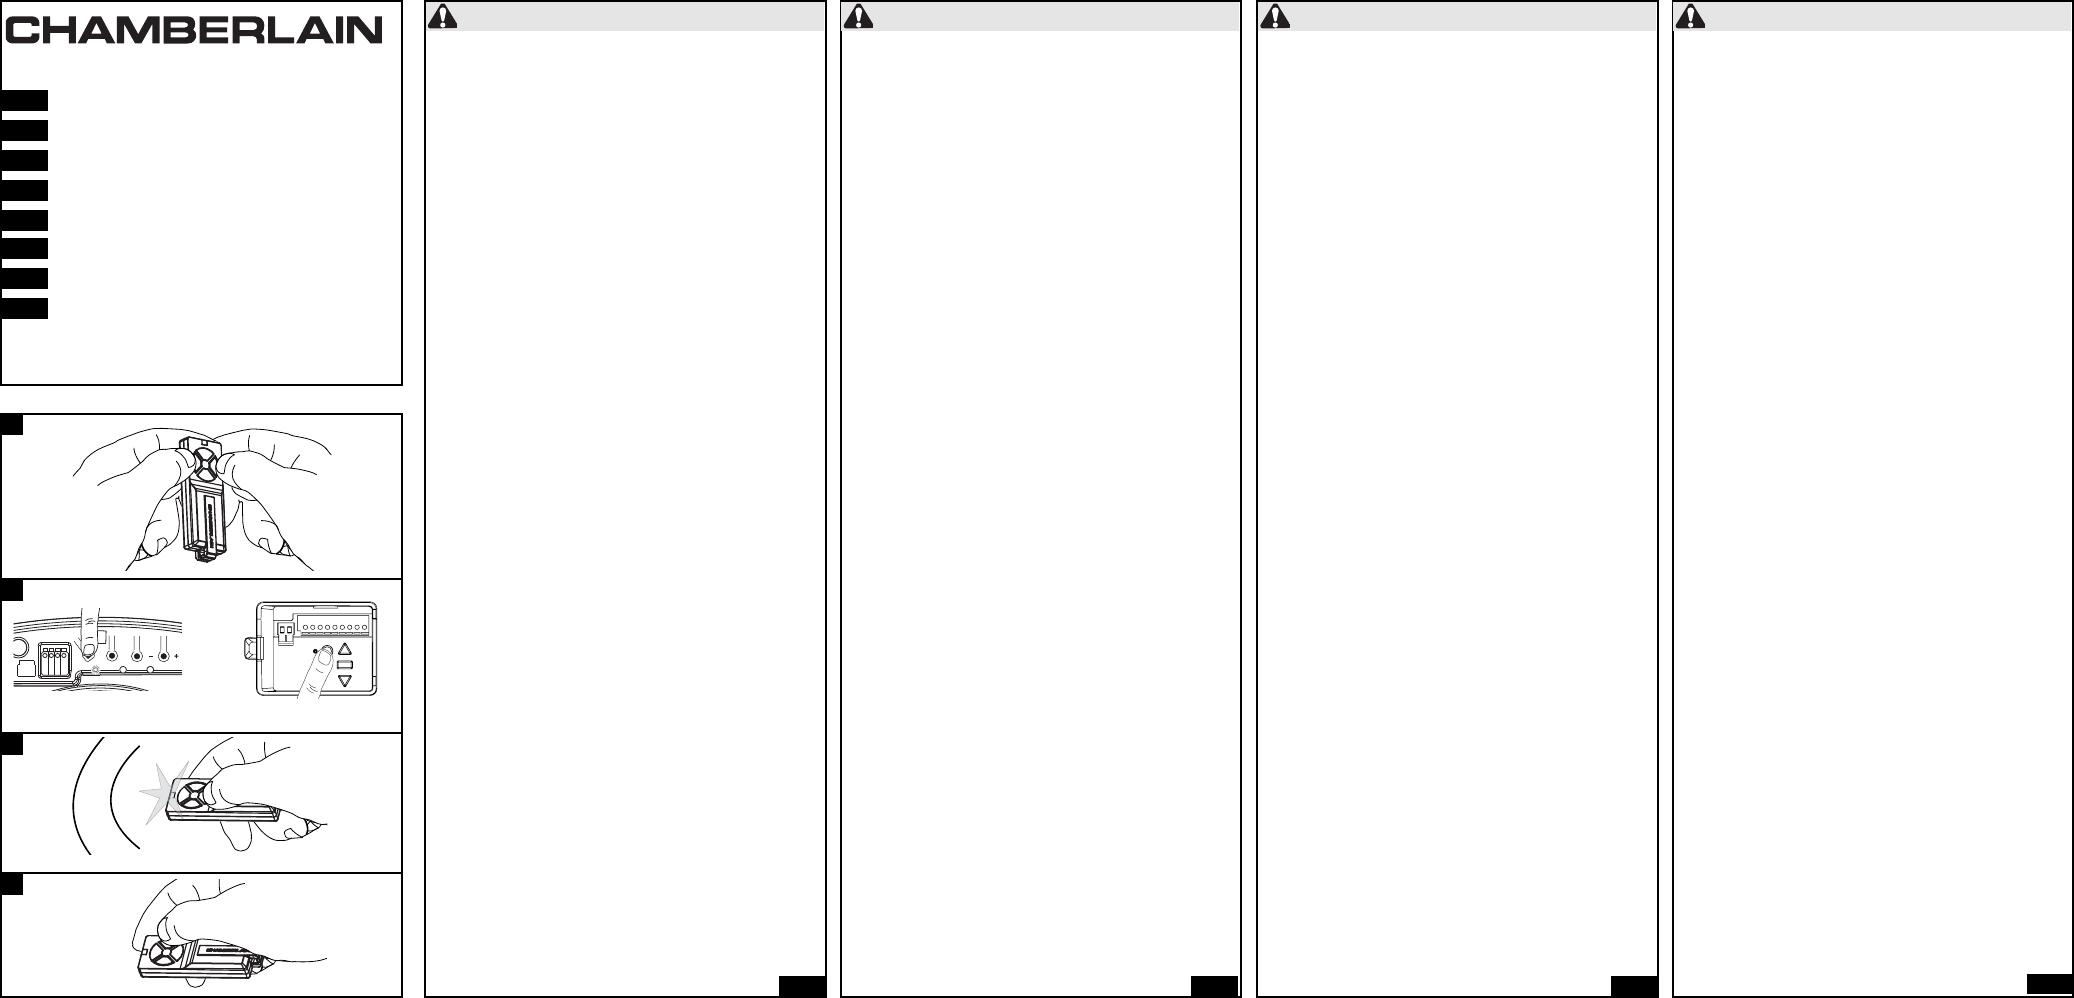 Handleiding Chamberlain Tx4runi Pagina 1 Van 2 Dansk